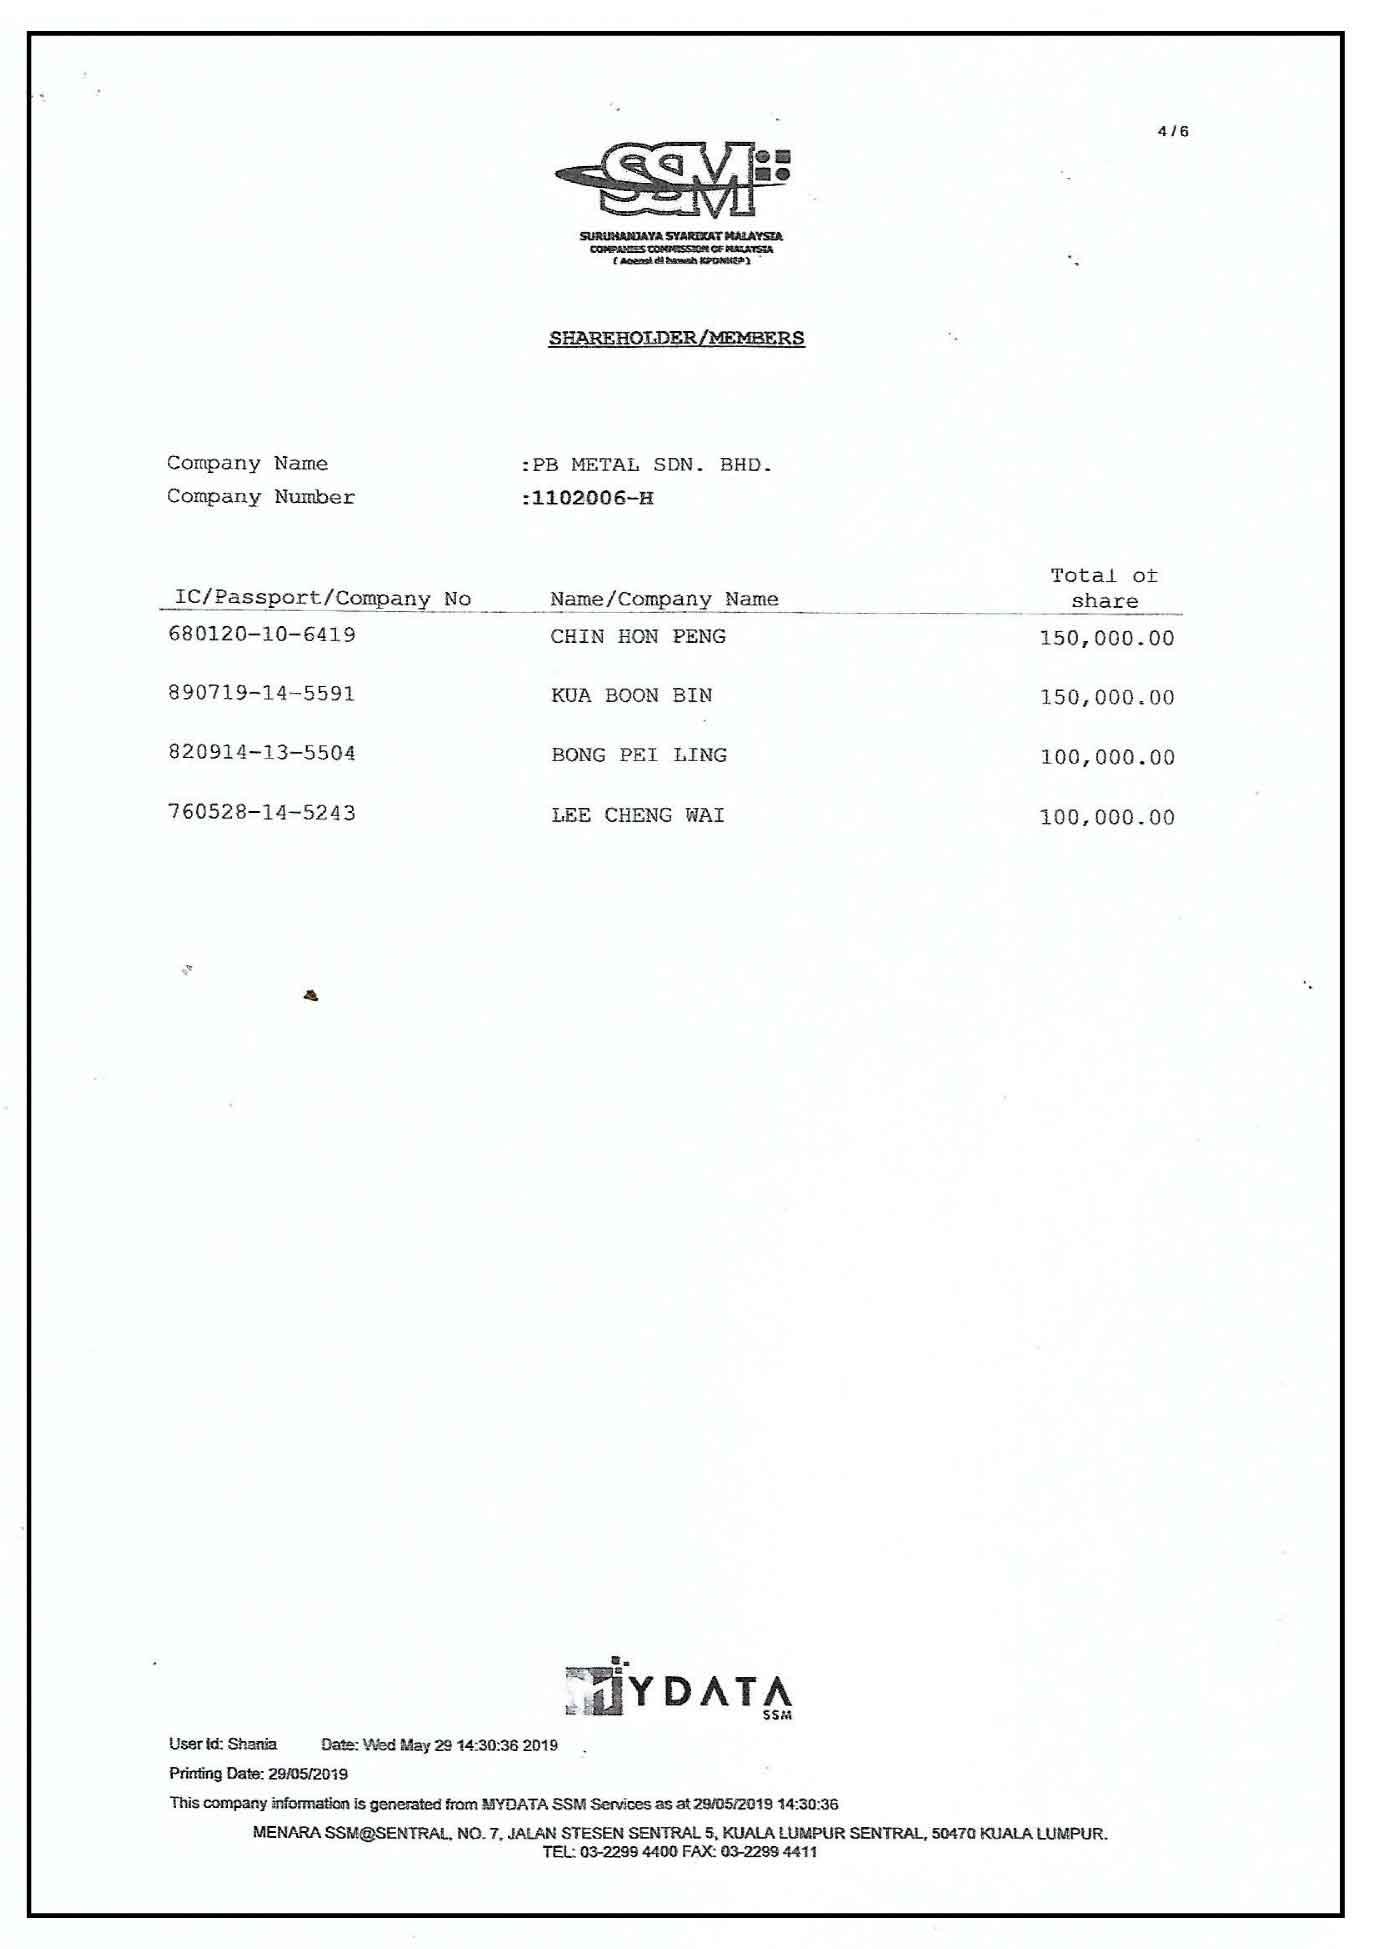 Shareholders & Members